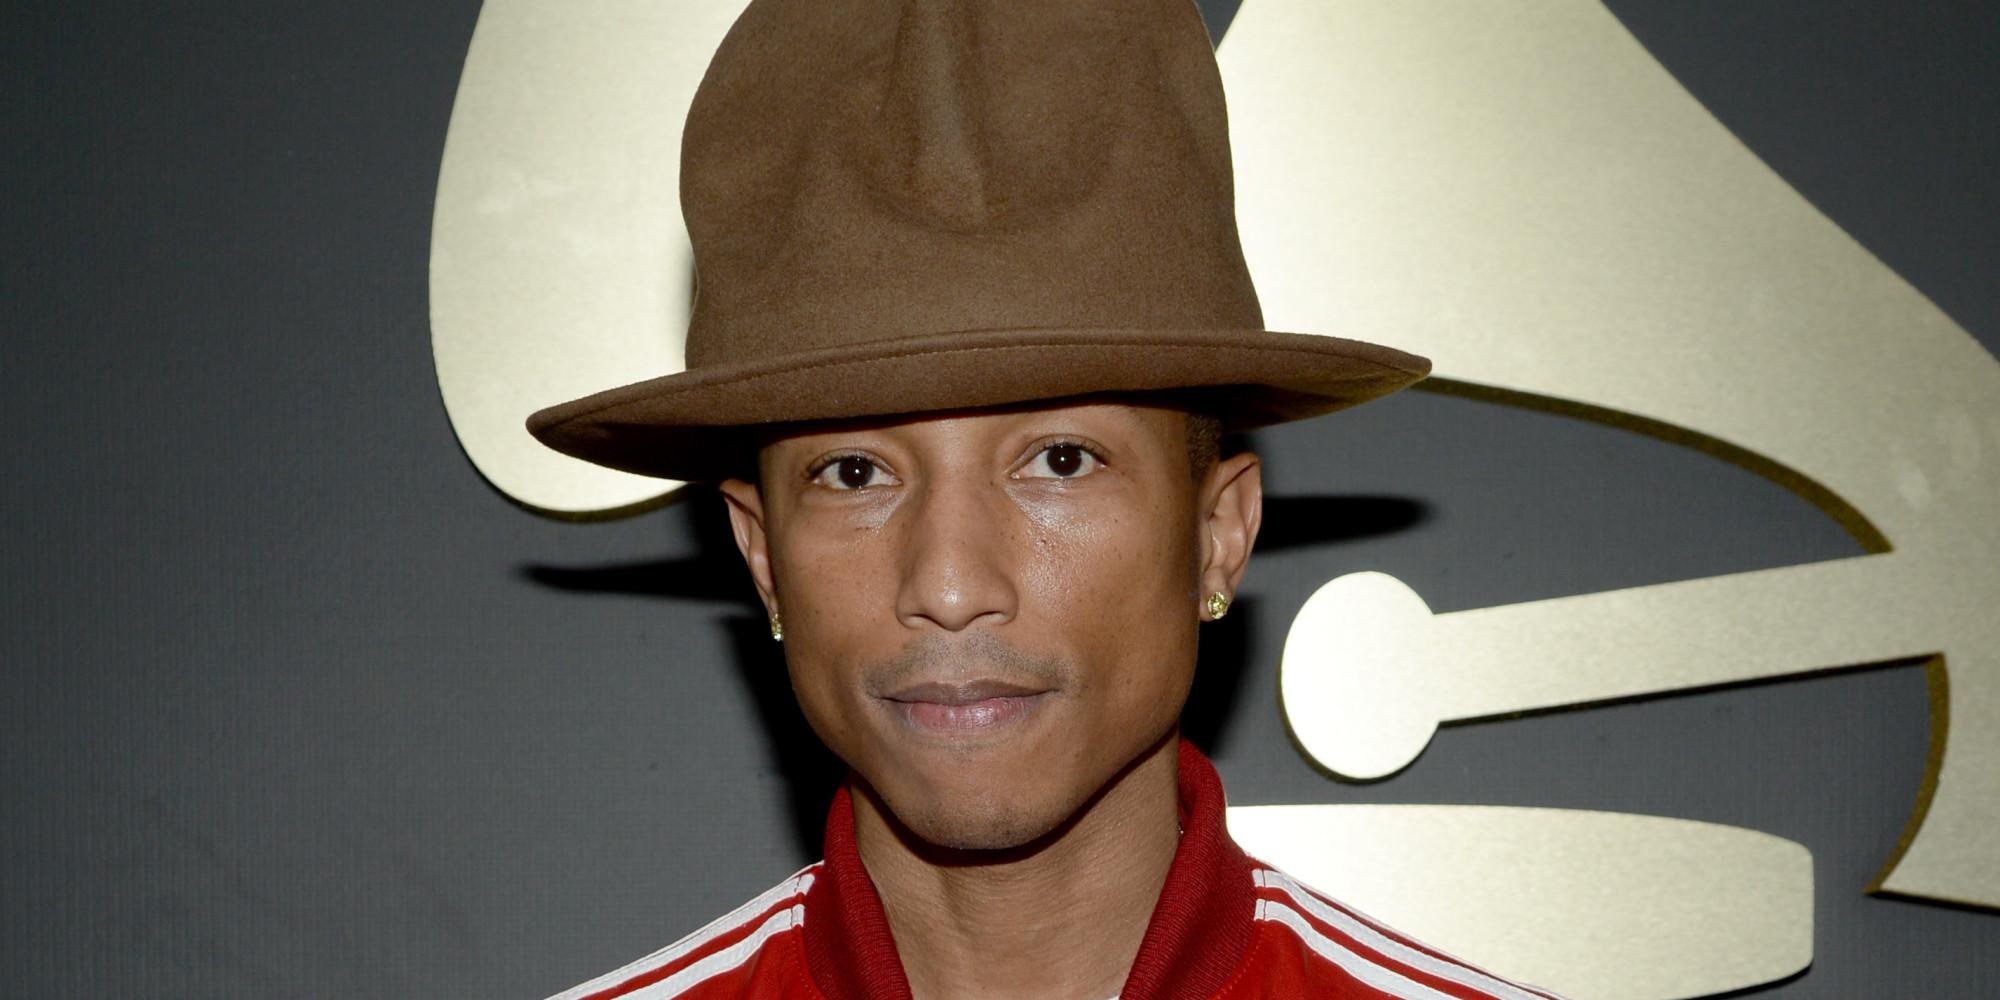 Pharrell Hat The Voice Pharrell Williams' Mountie Hat